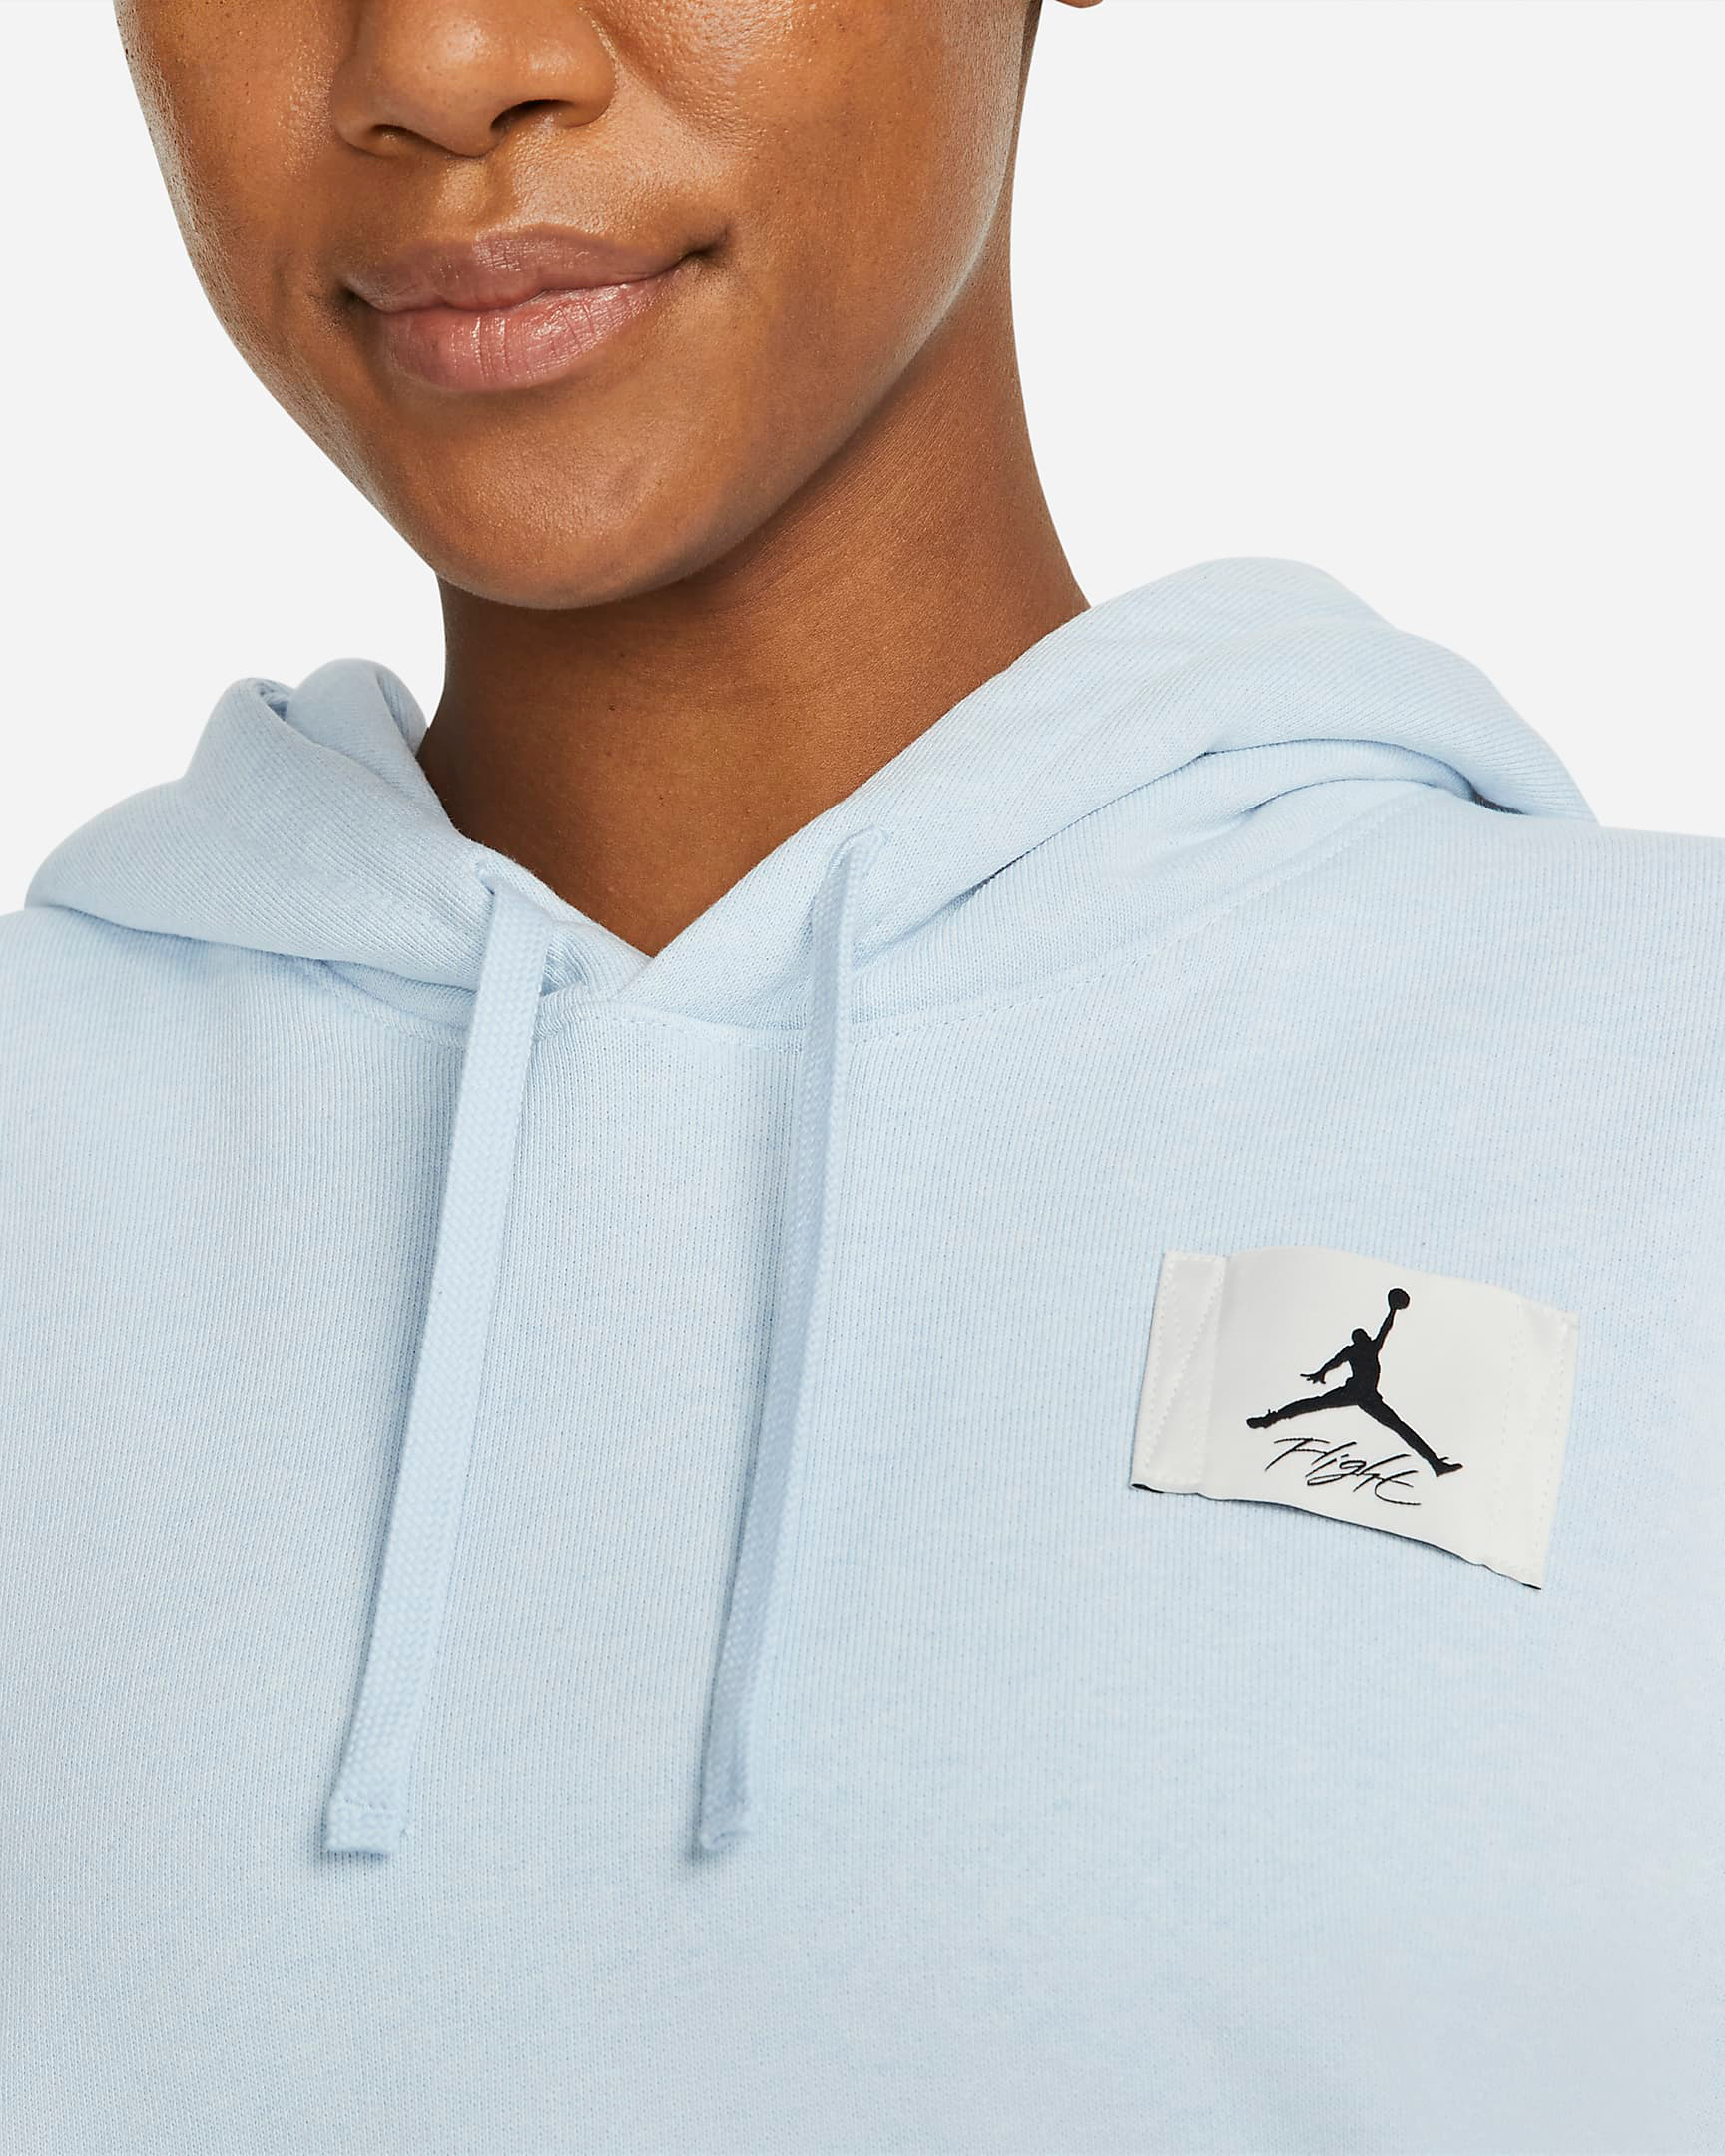 air-jordan-5-womens-blue-bird-hoodie